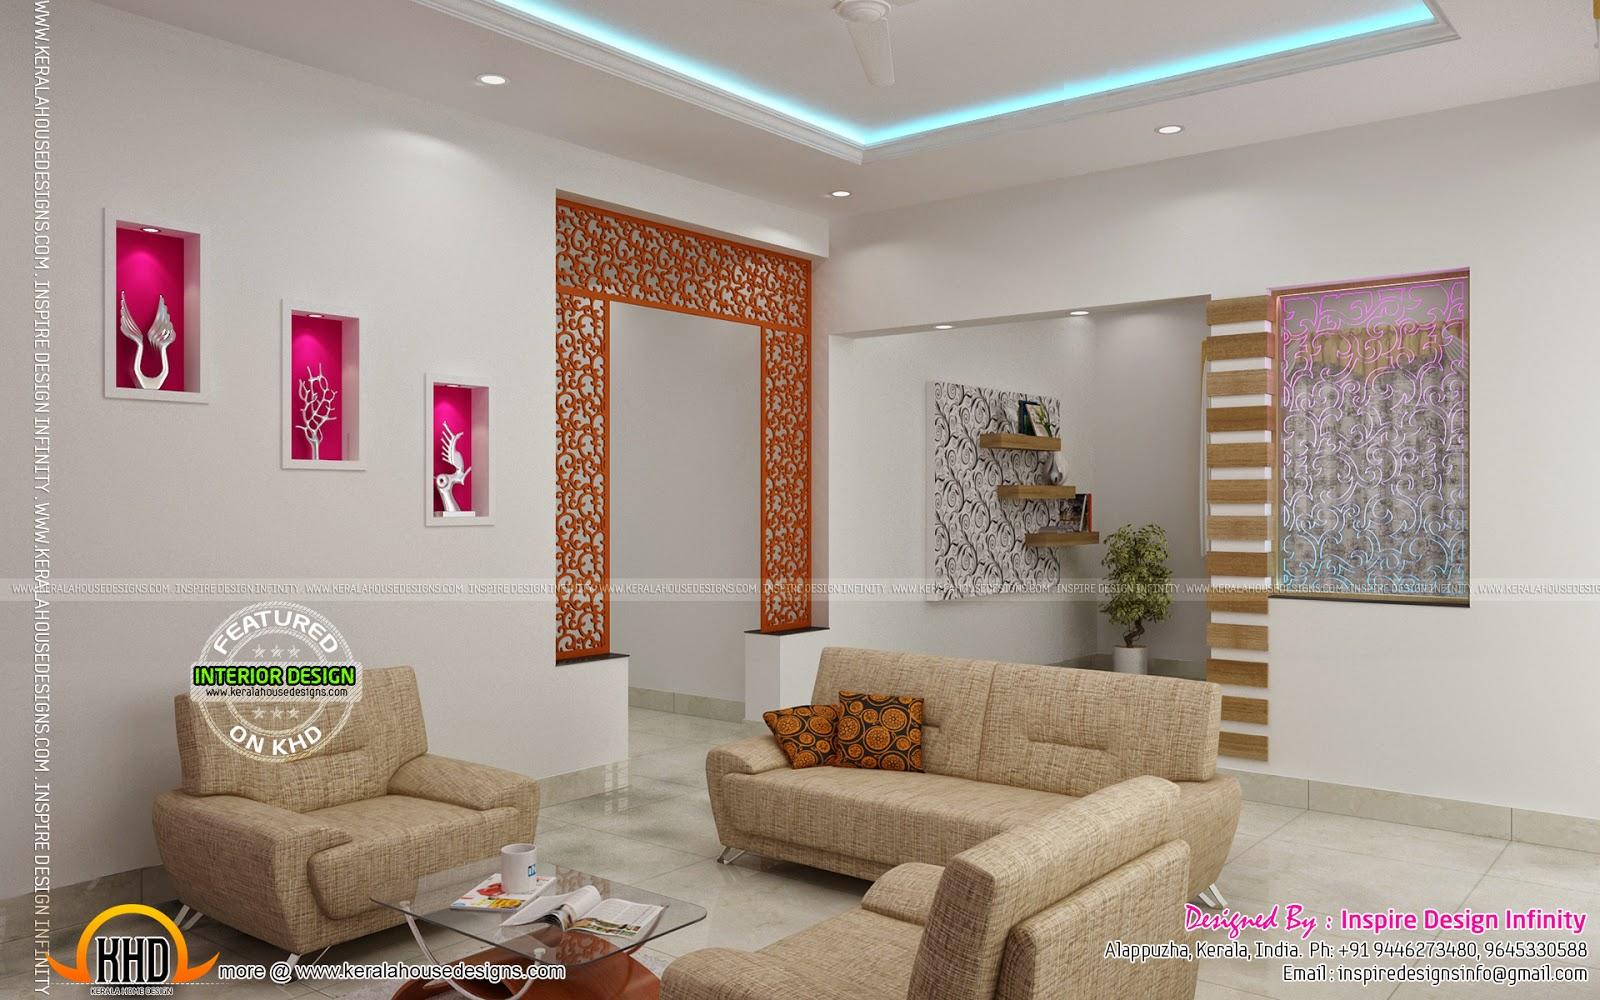 Interior designs by Inspire Design Infinity - Kerala home ...